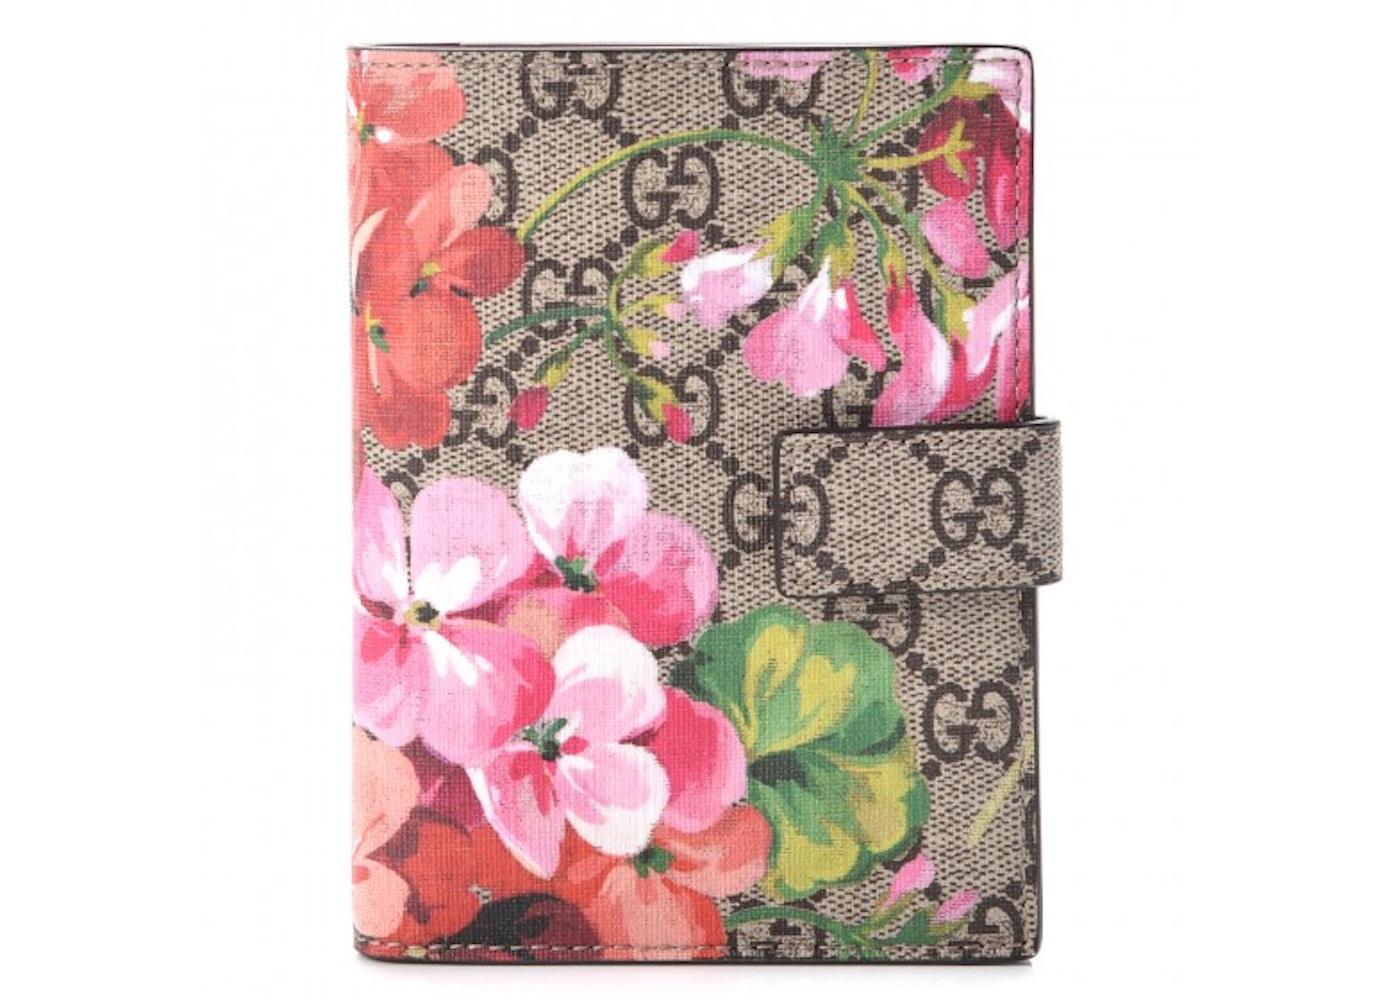 2bf790750a0 Buy   Sell Gucci Collectors Handbags